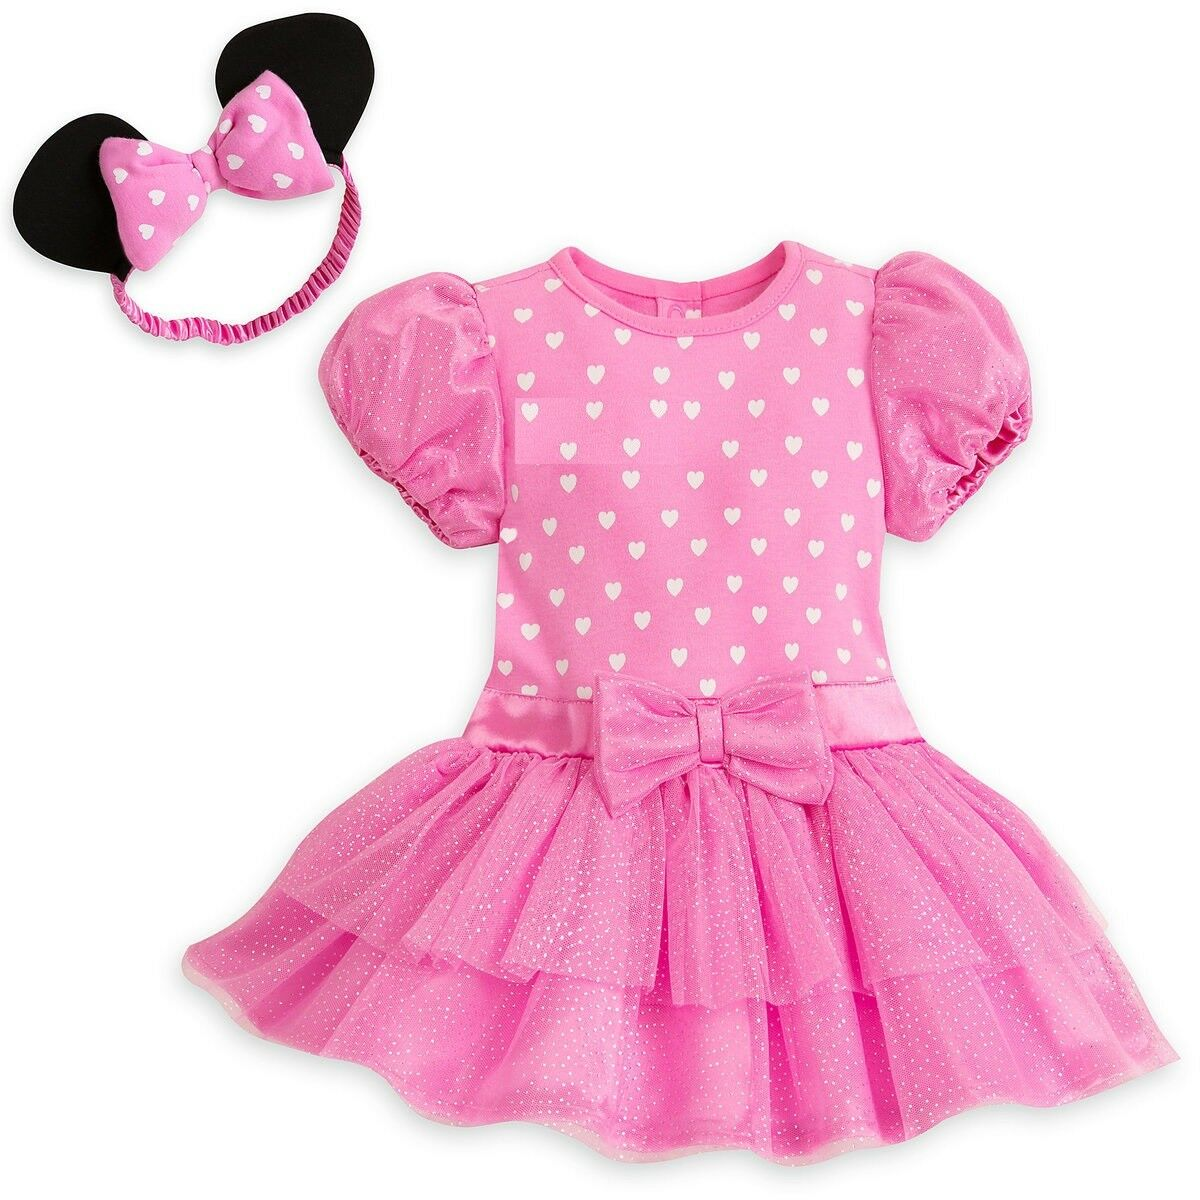 Disney Minnie Mouse Pink Baby Bodysuit & Headband 3 6 9 12 1